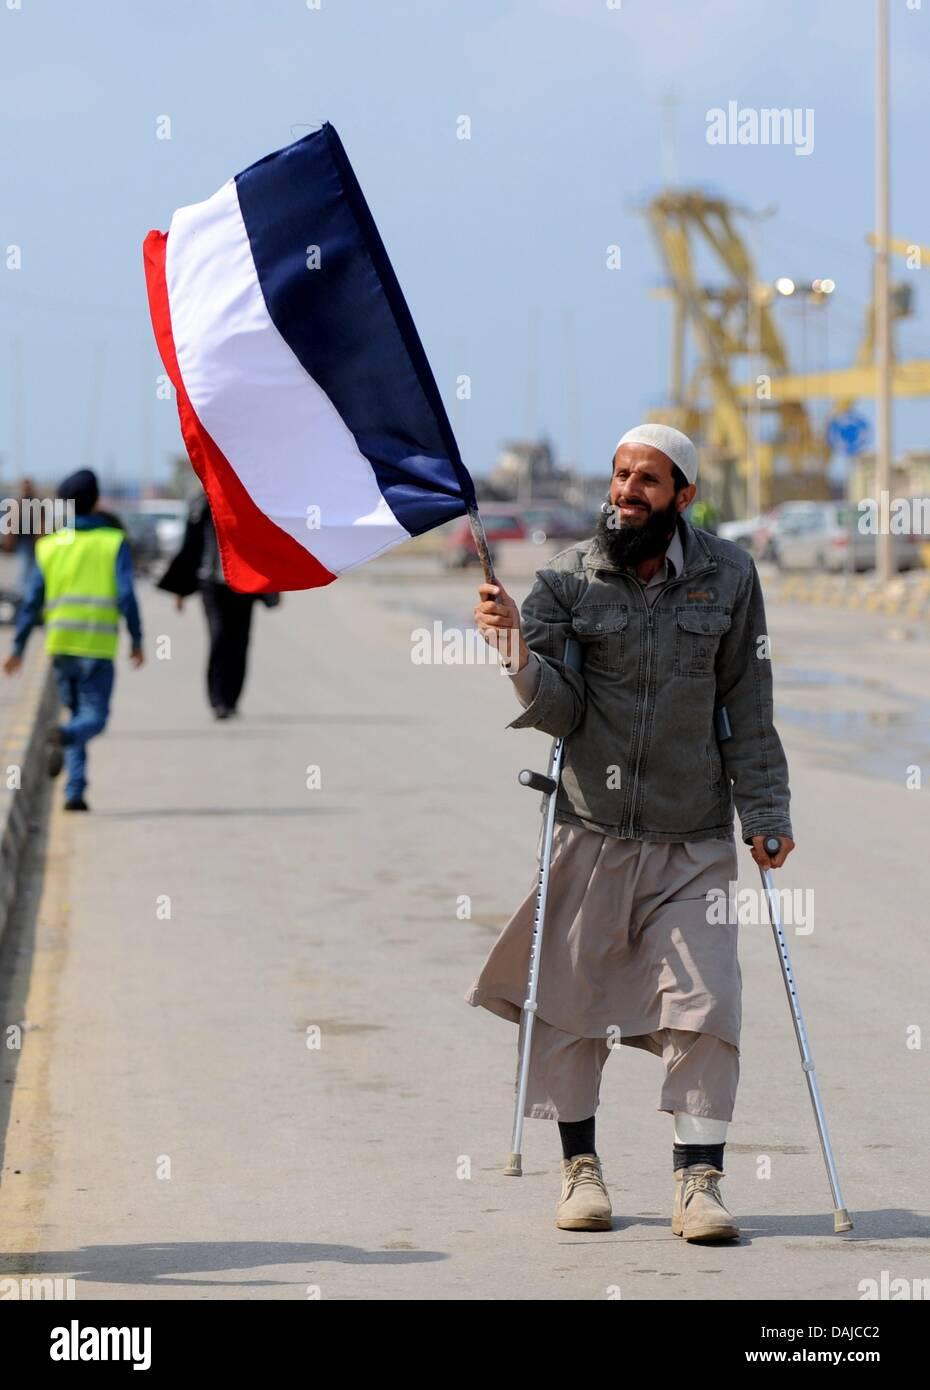 A man carries a French flag in rebel-held Benghazi, Libya, 03 April 2011. Libyan leader Muammar Al-Gaddafi continues - Stock Image